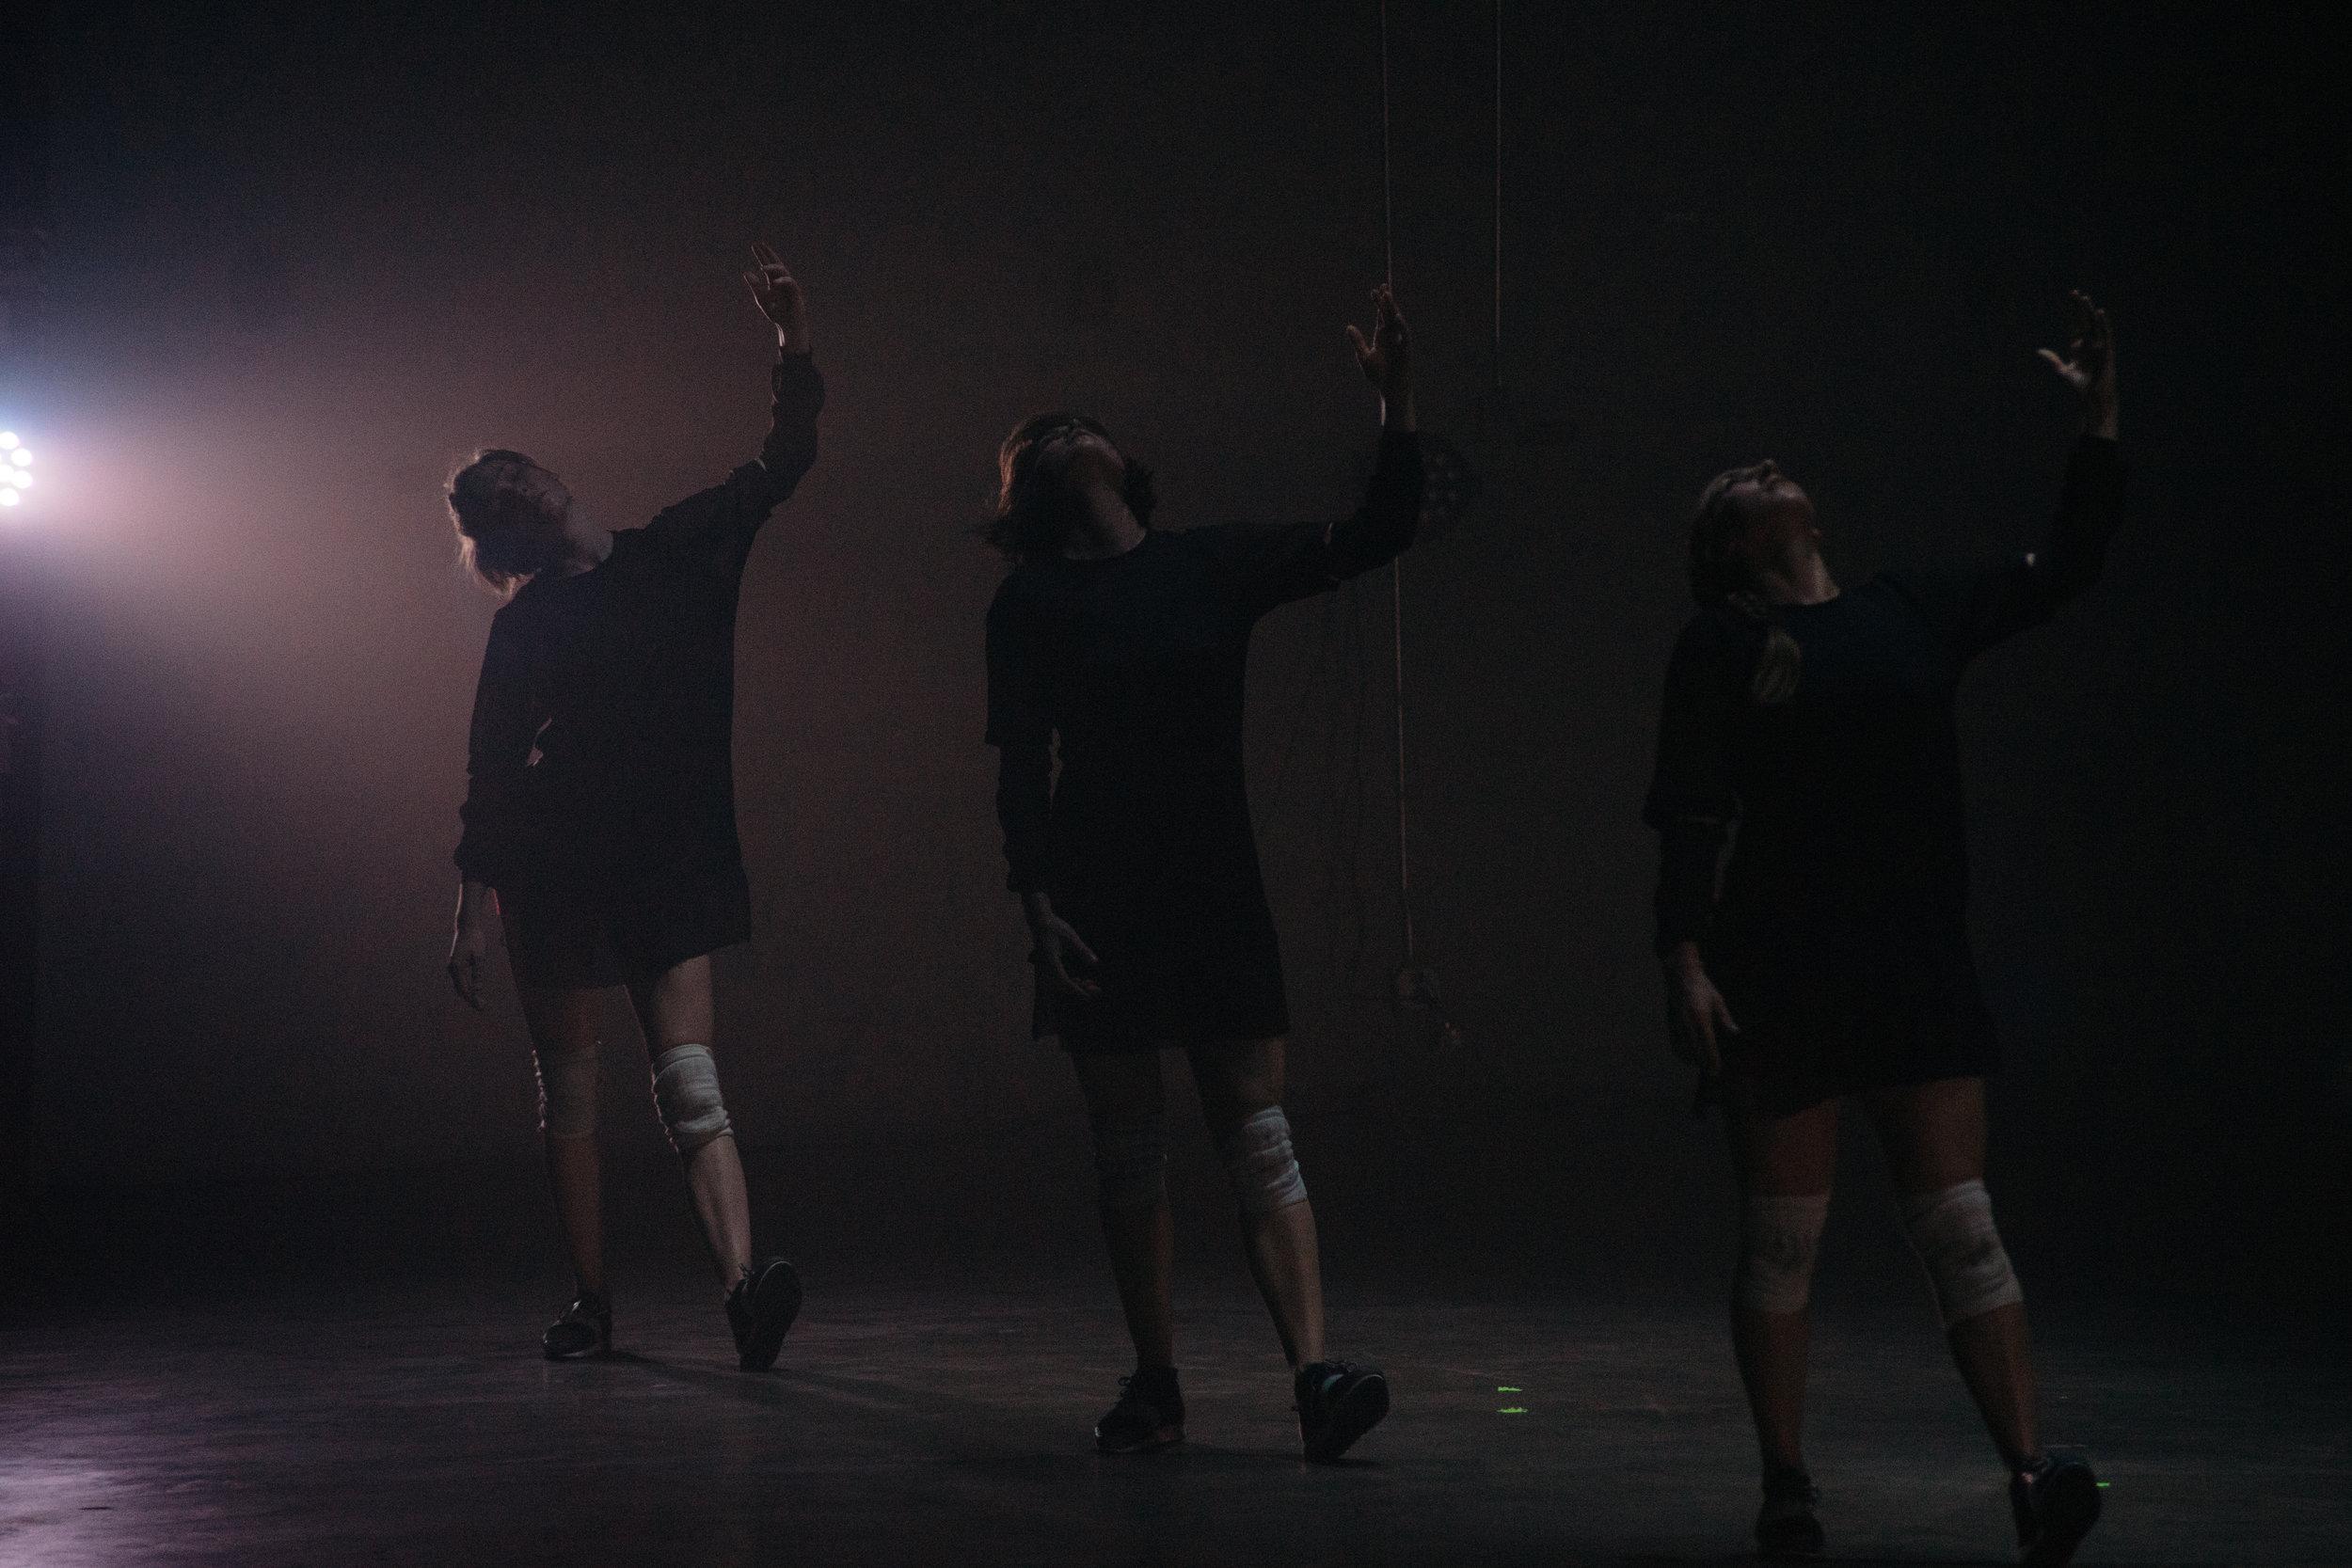 Dancers: Katie Gunderson, Taryn Lavery, Katie Hopkins